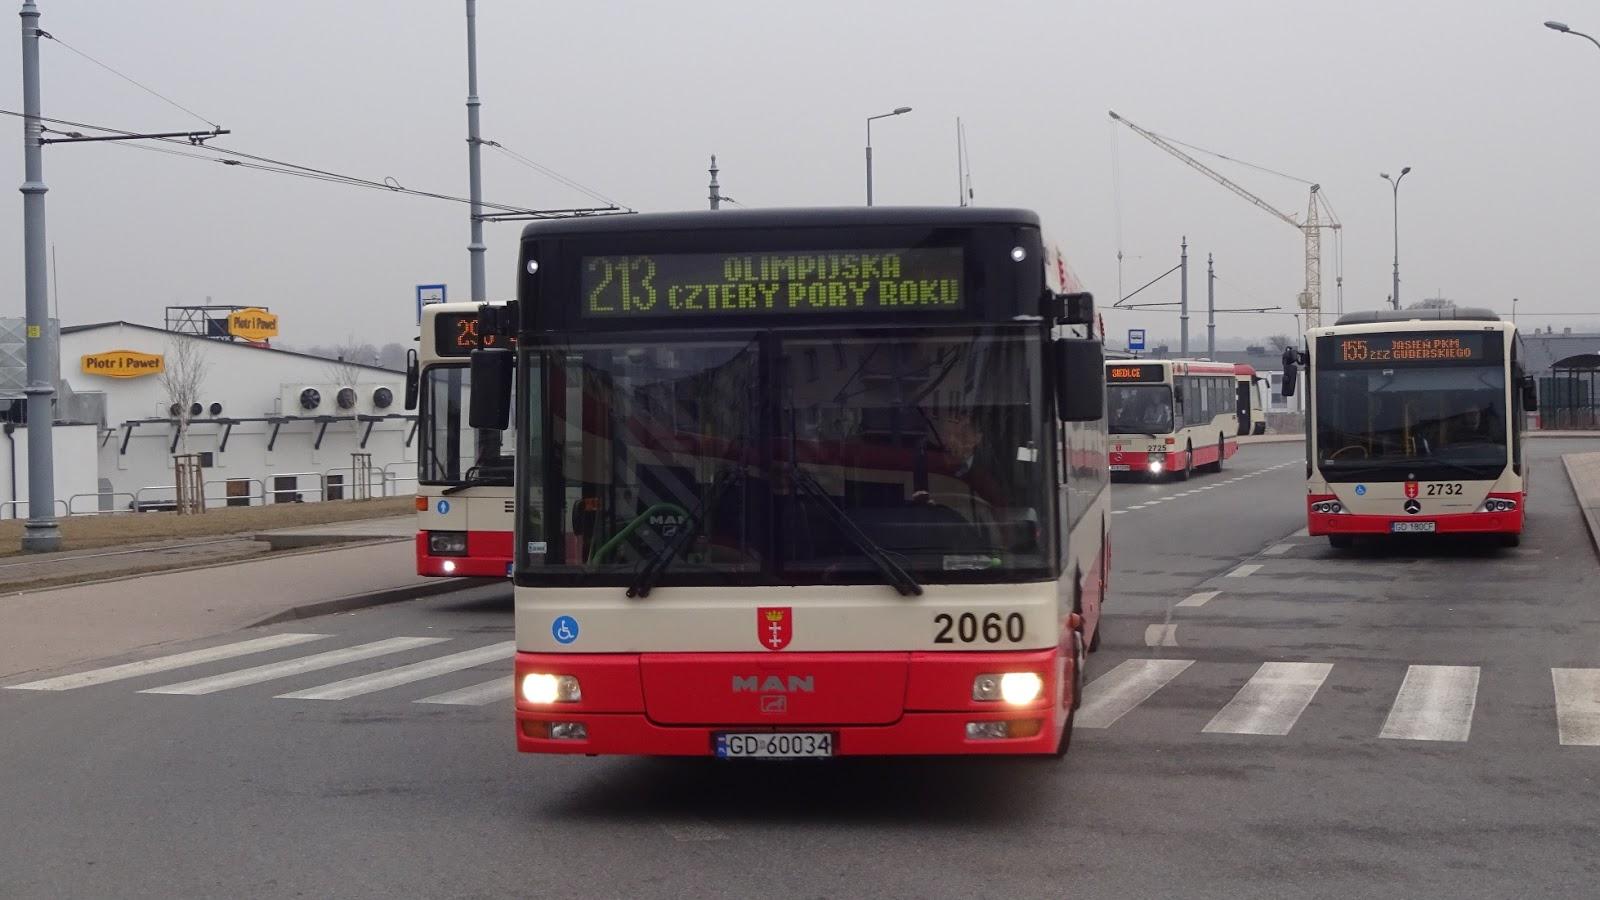 Gdansk-poludnie- komunikacja-113-154-213-autobusy